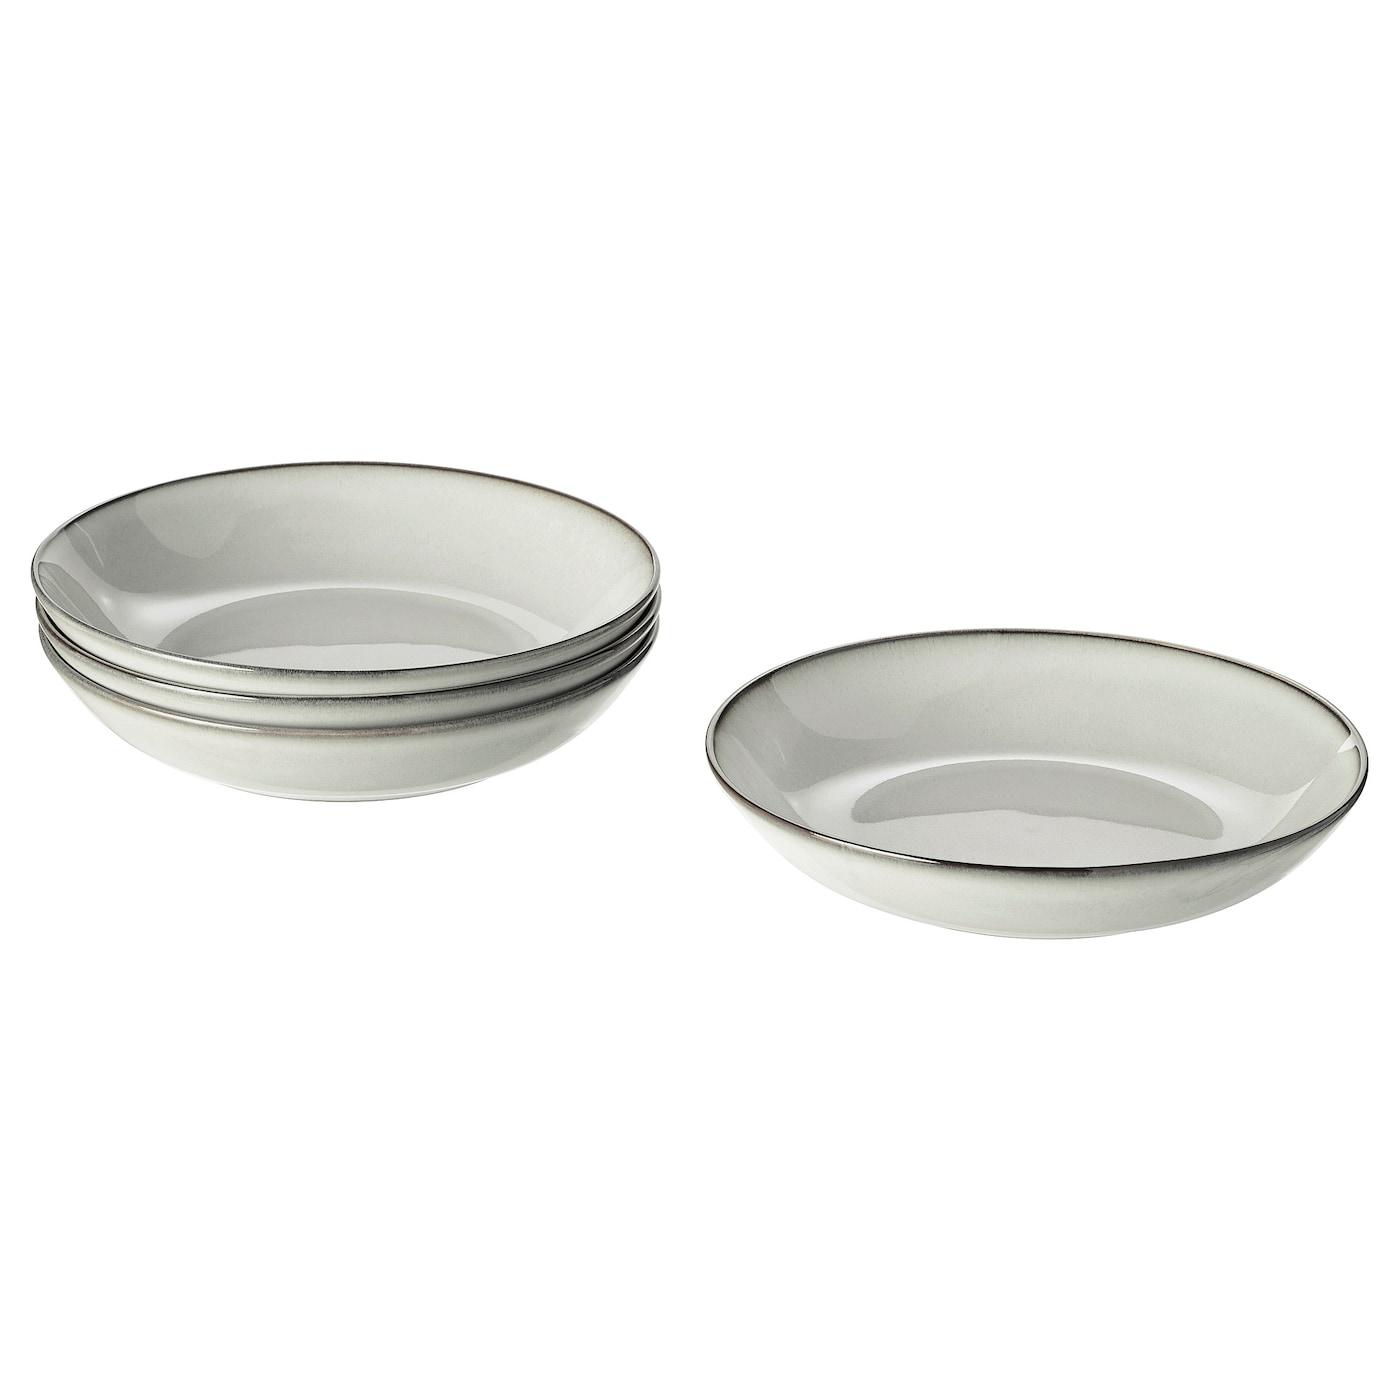 2 Restaurant or Home Aluminium Metal Bowl Dish Plates